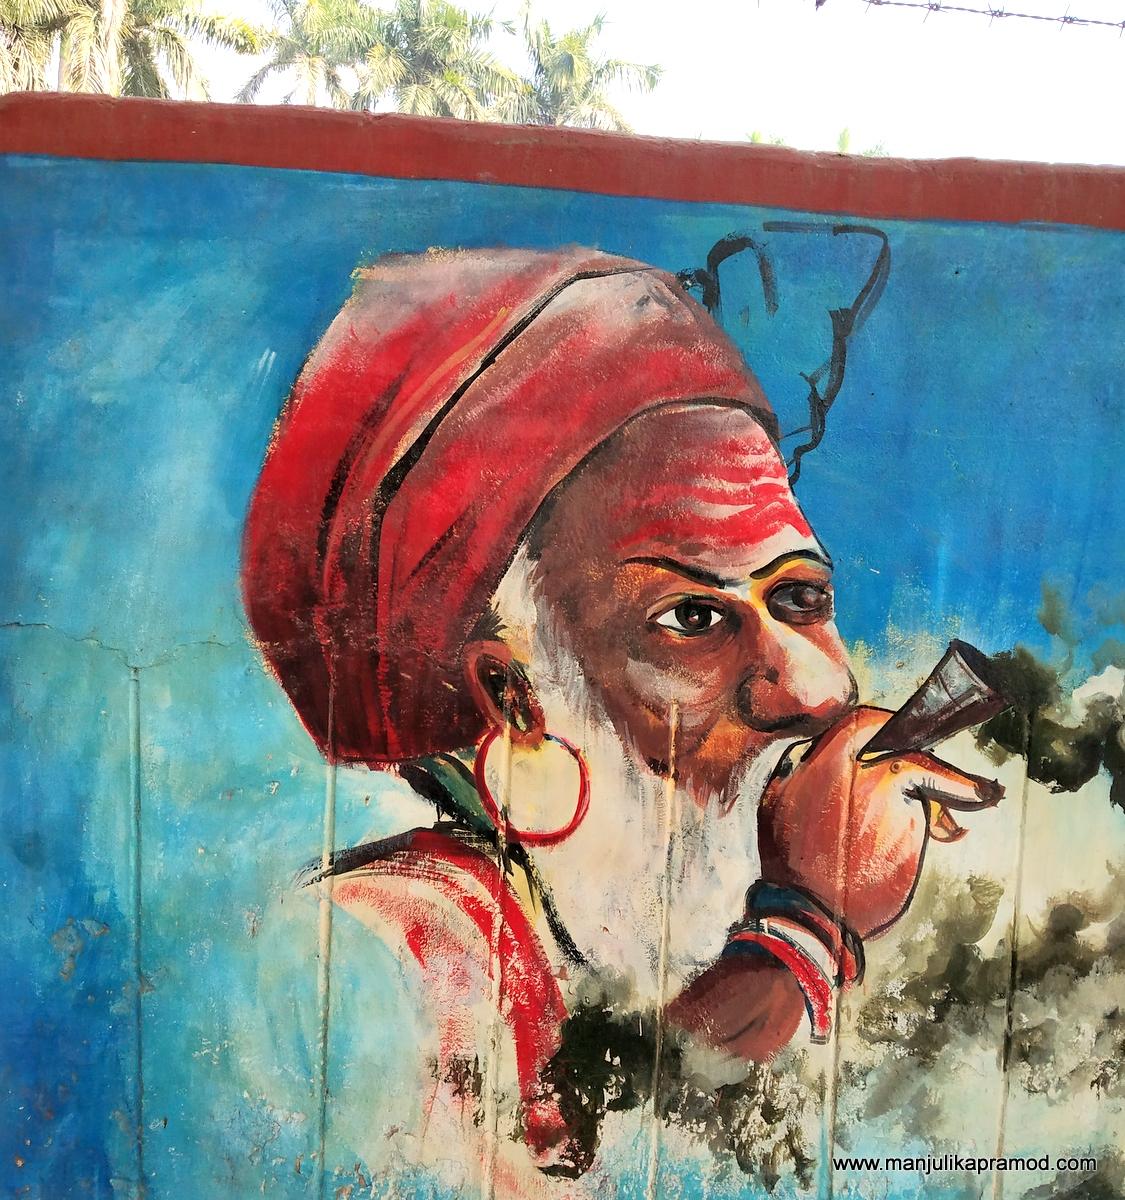 A street art showing a saint in Varanasi.